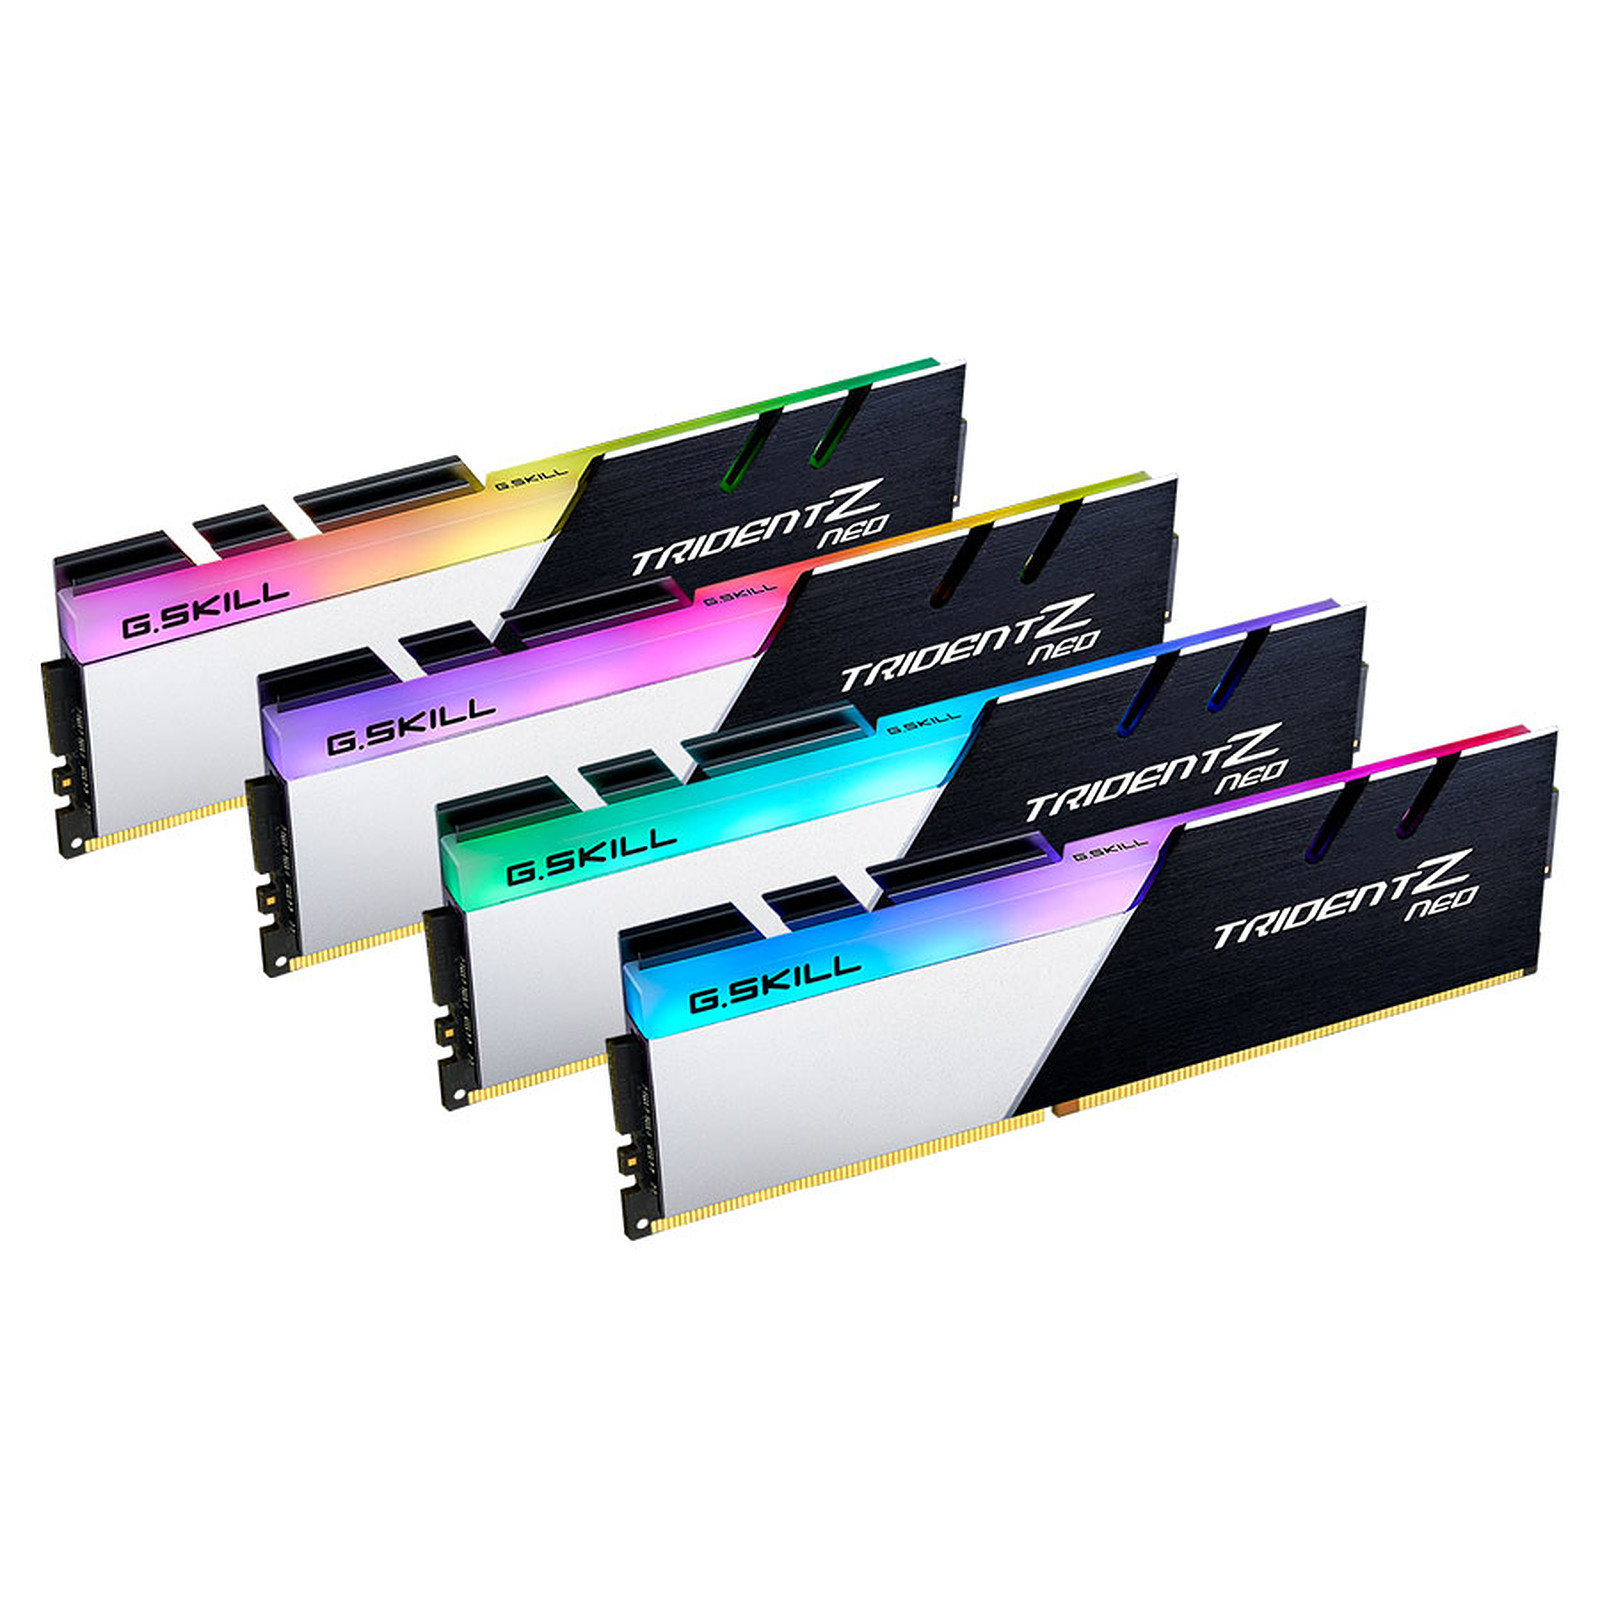 G.Skill Trident Z Neo 128 GB (4 x 32 GB) DDR4 3600 MHz CL18